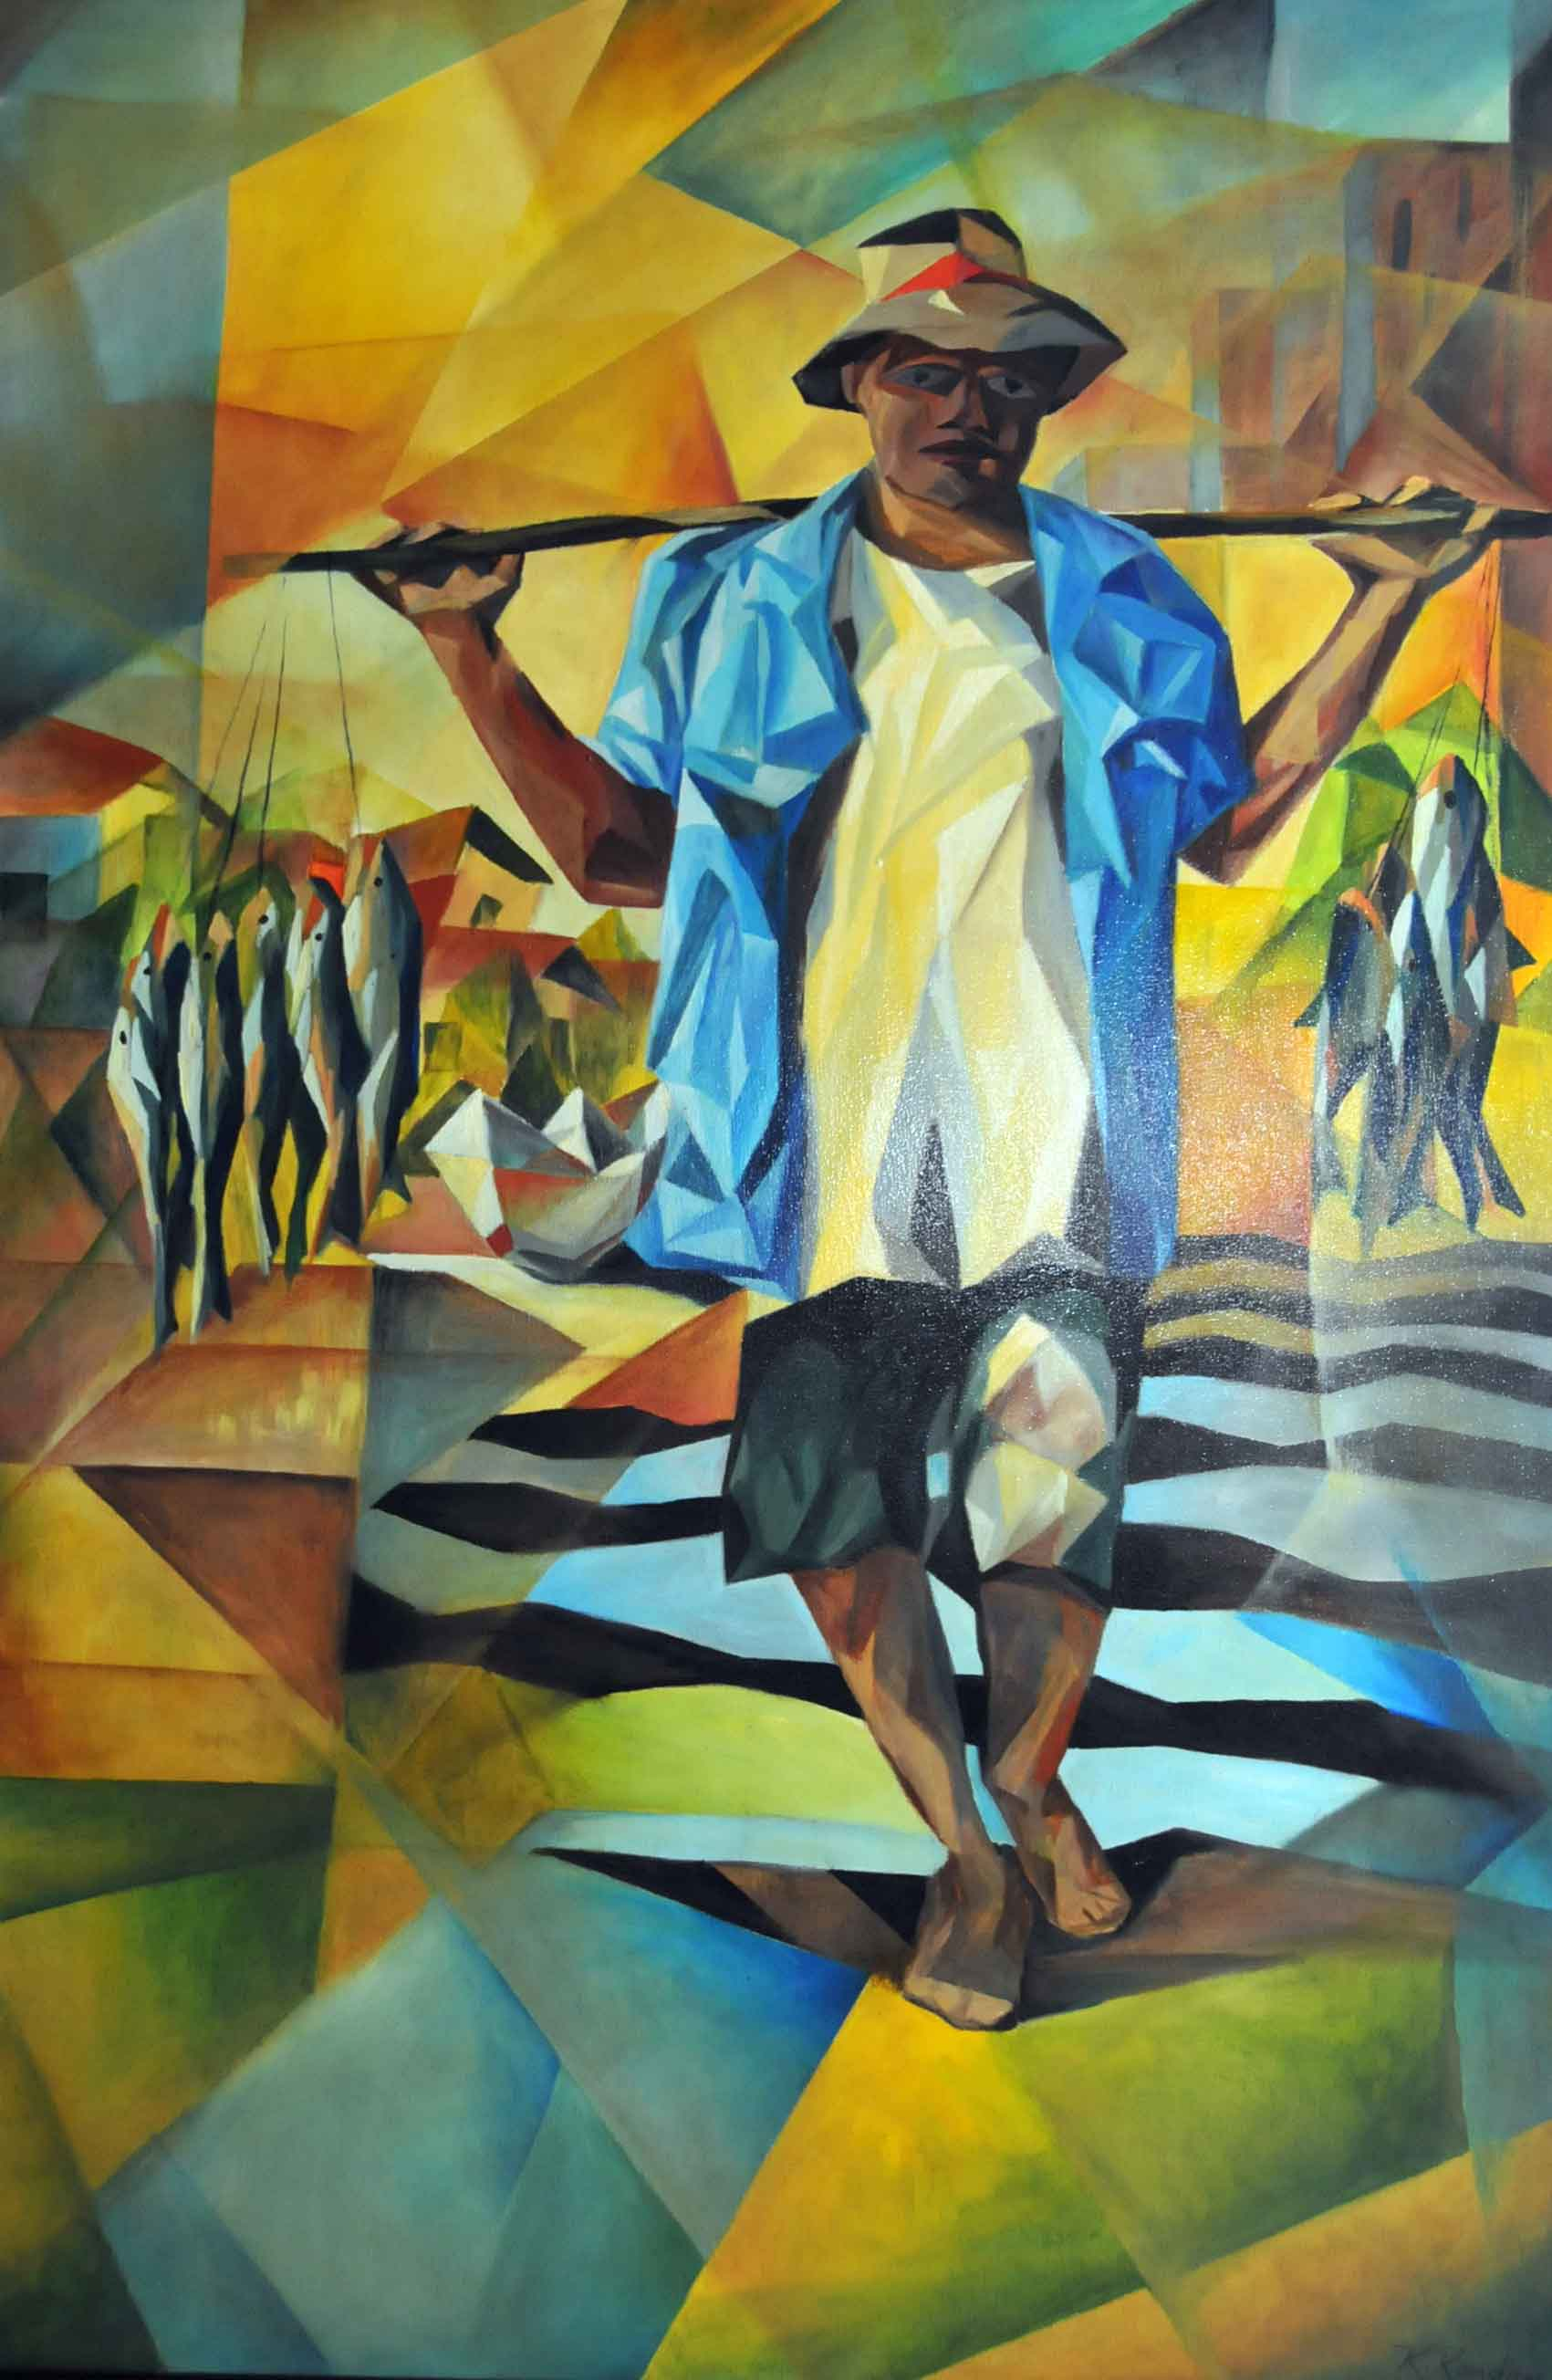 Praia-Grande-Artes-Rodolfo-Rondon-ft-Jairo-Marques-bx